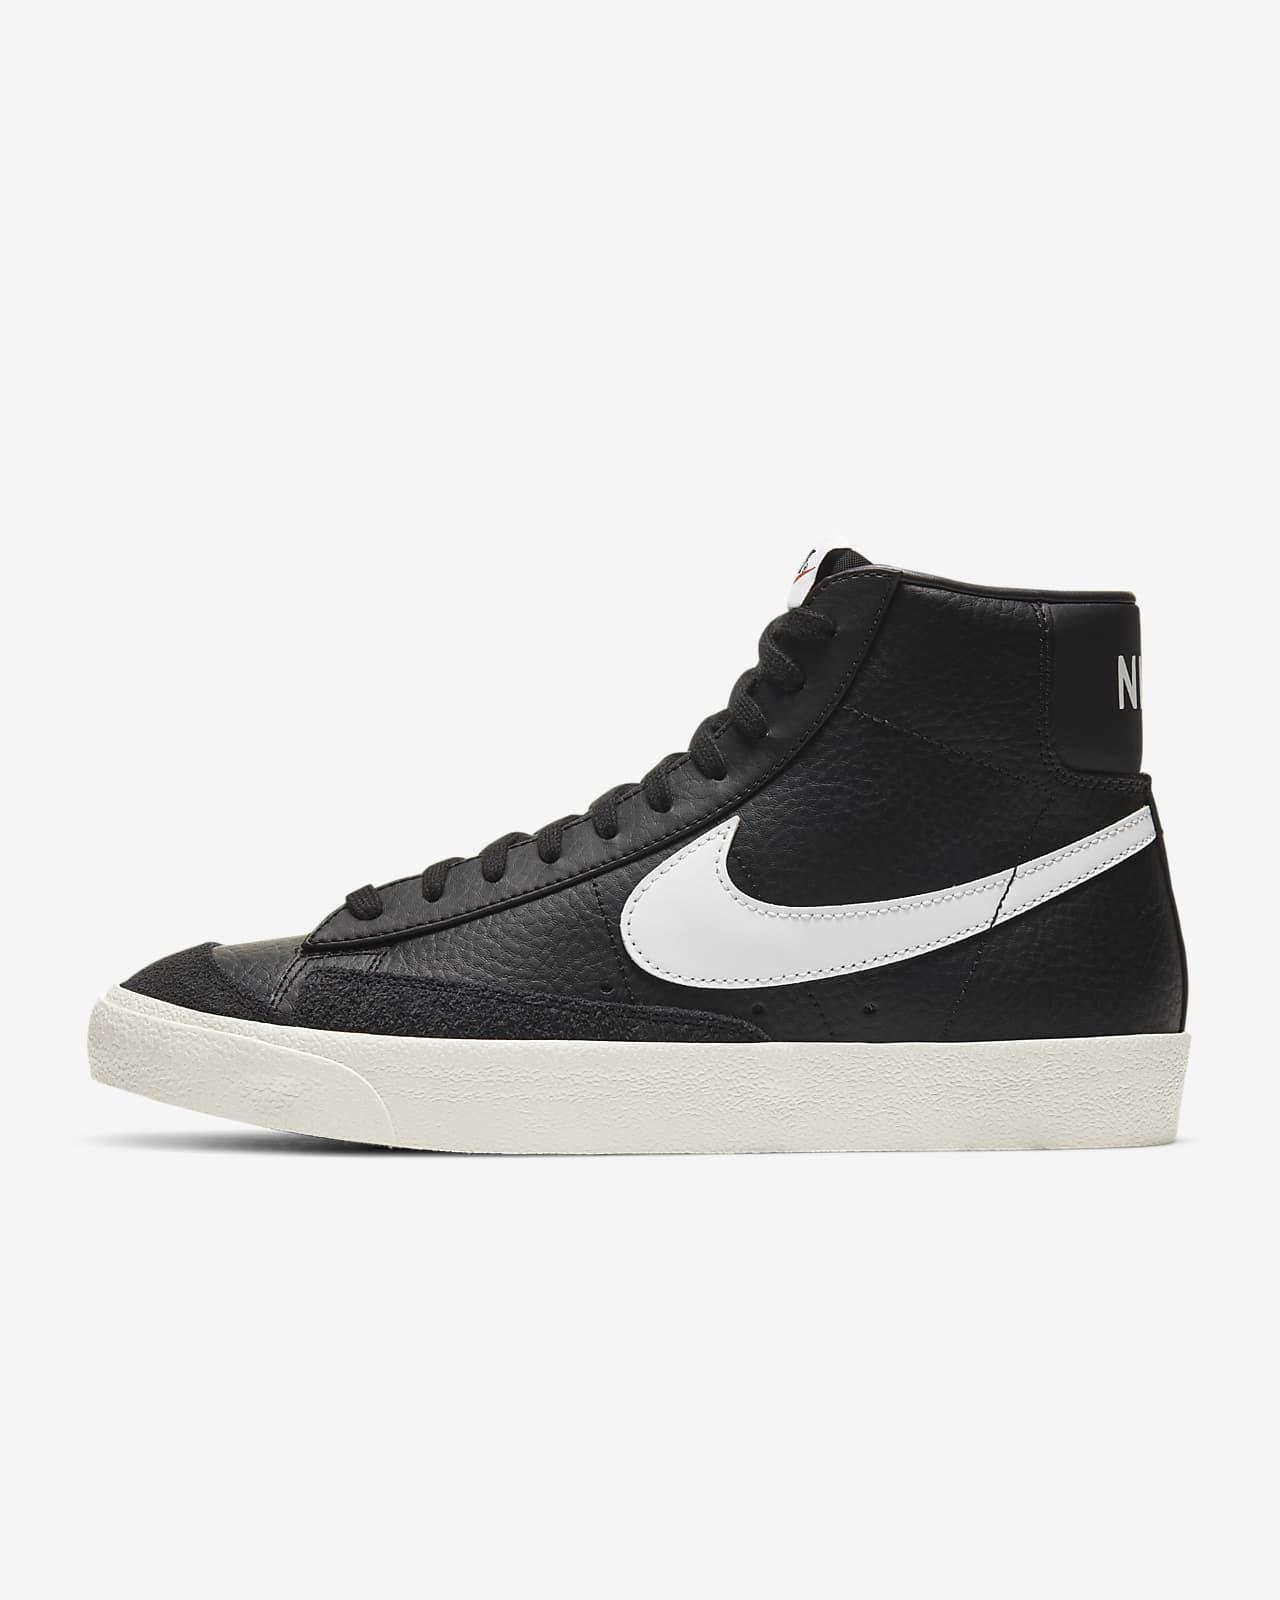 Chaussure Nike Blazer Mid '77 Vintage pour Homme. Nike LU